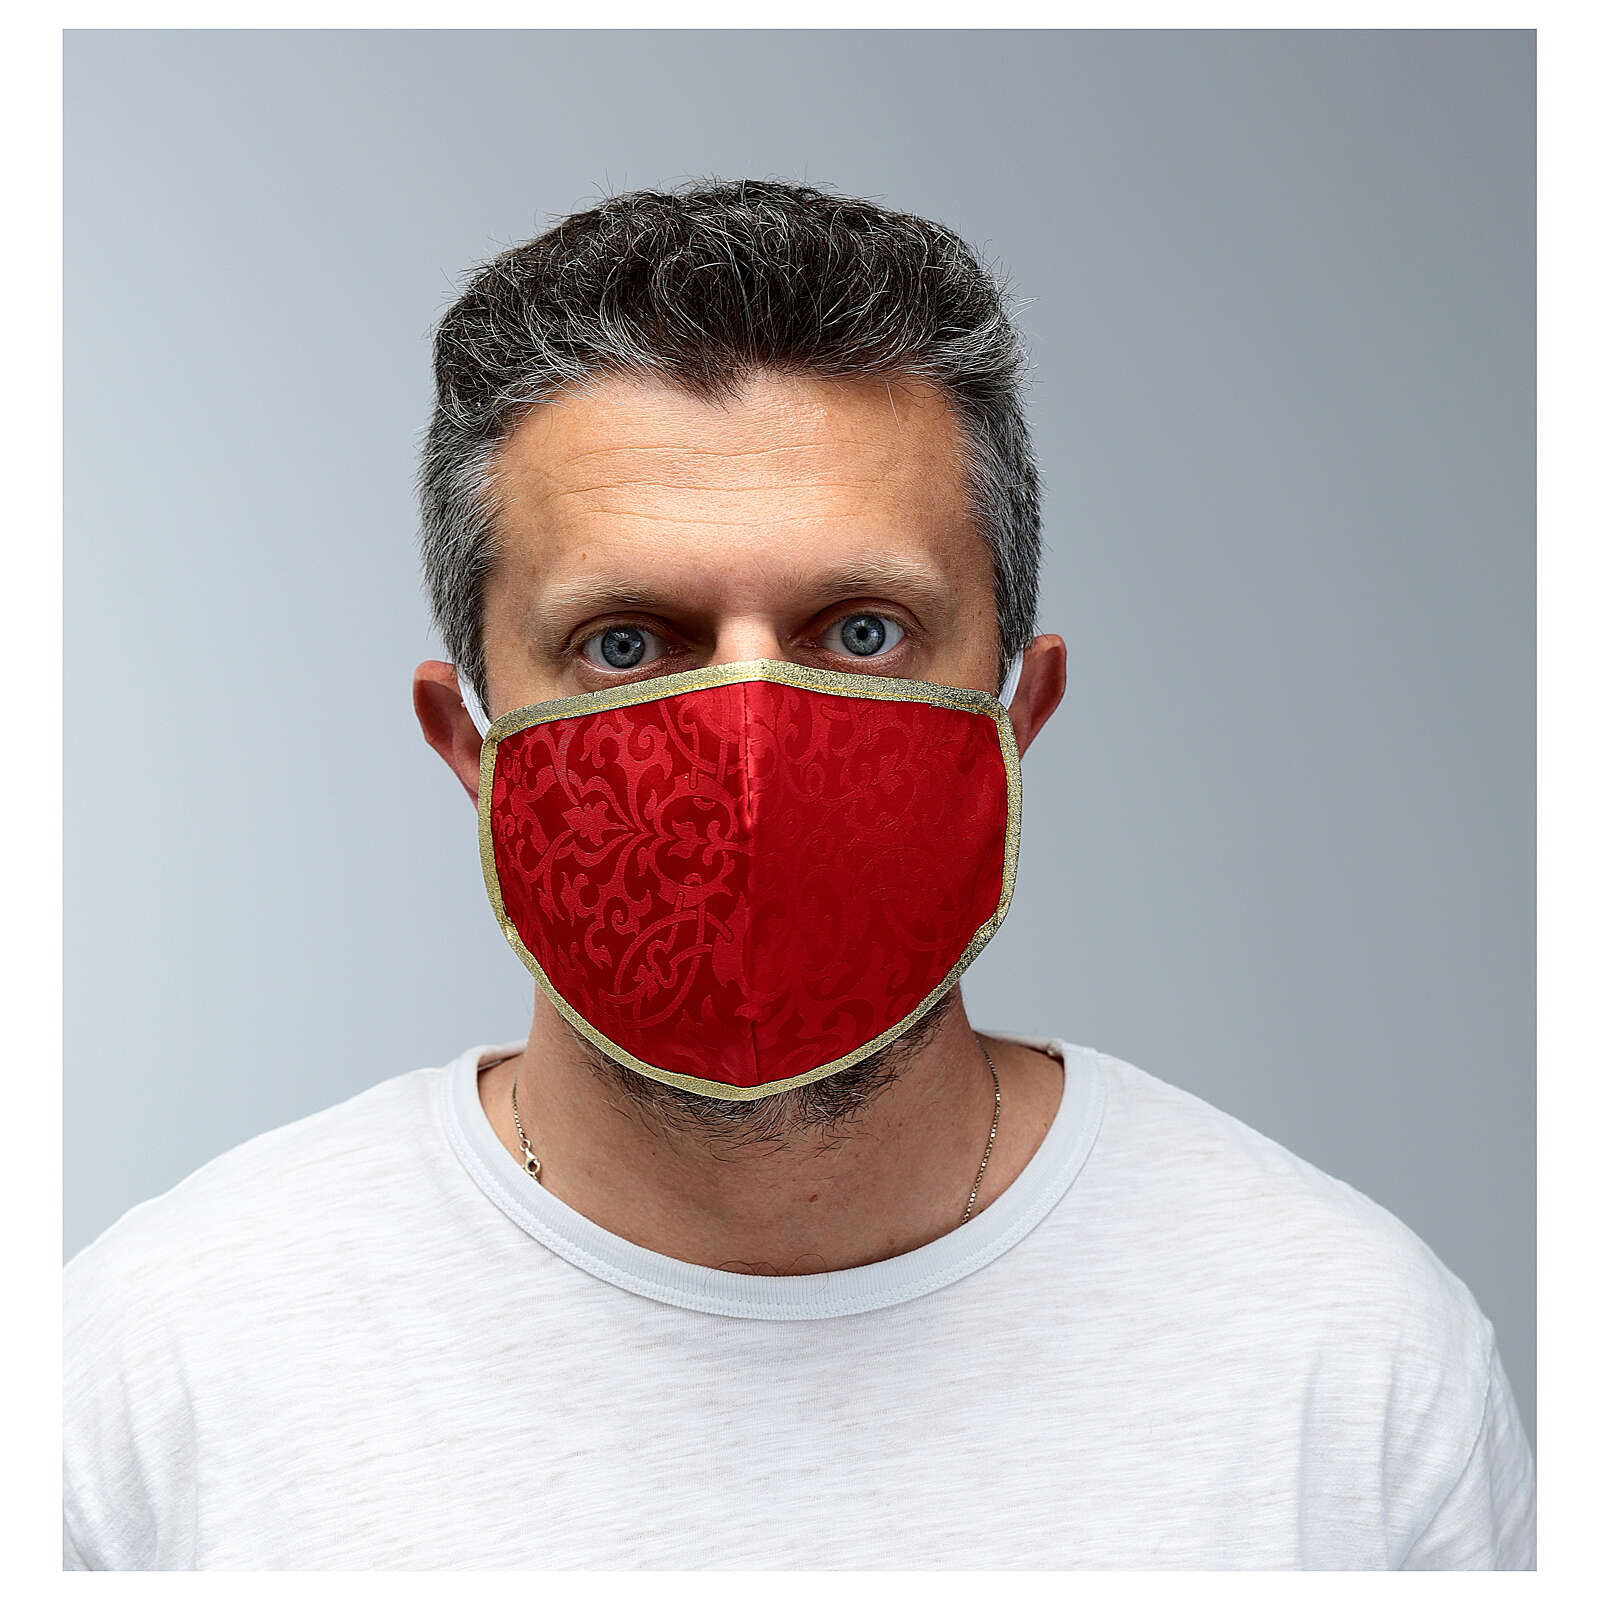 Masque lavable en tissu rouge/or 3